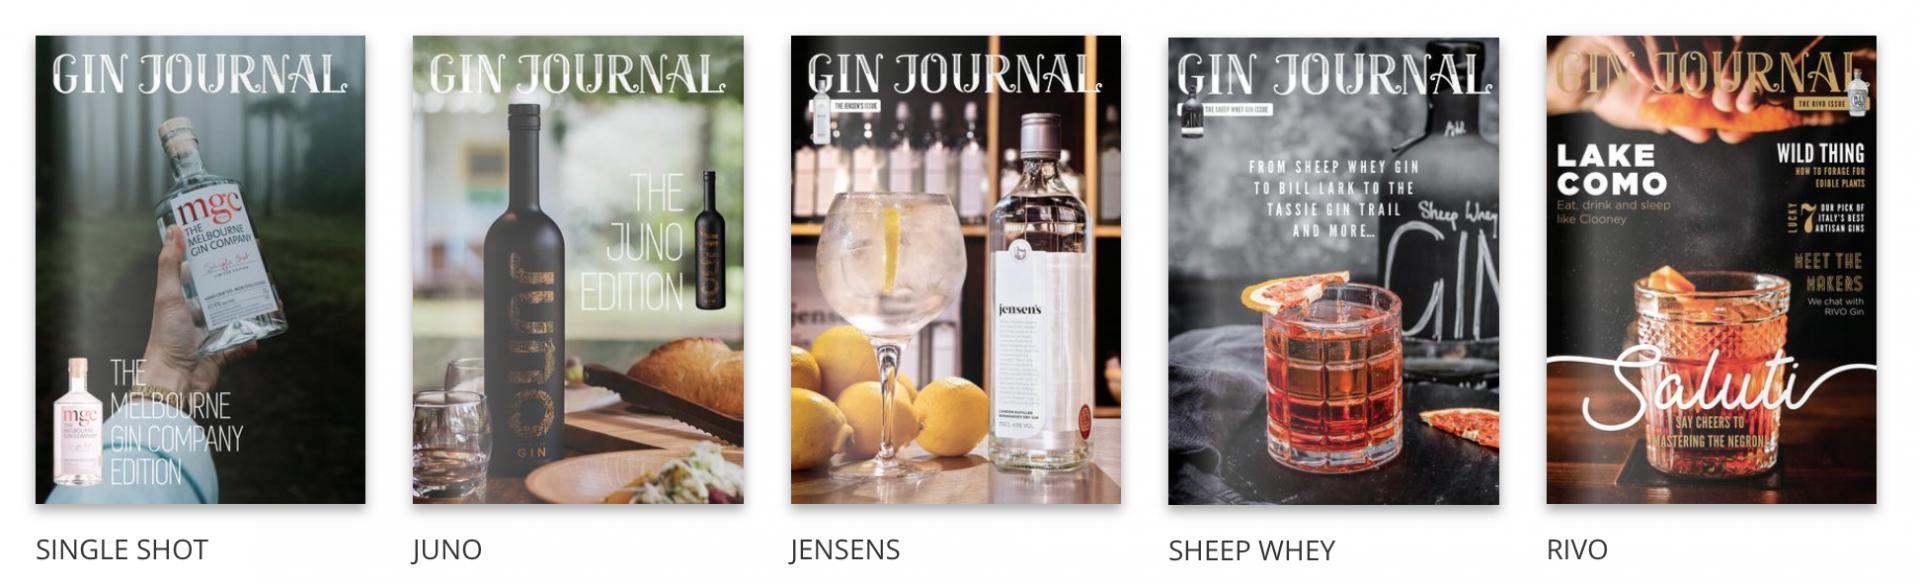 Gin Society Gin Journals